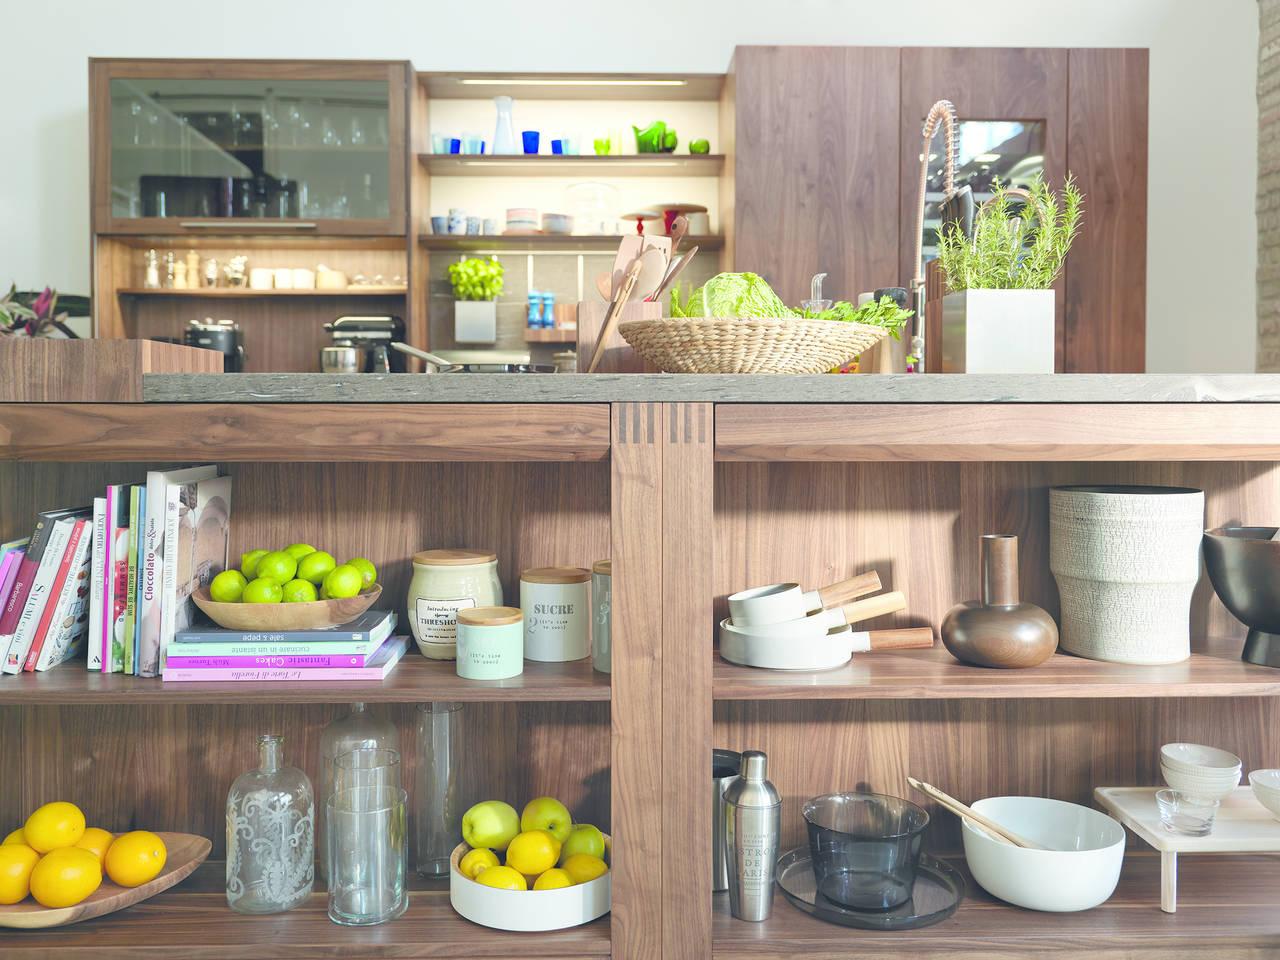 Una libreria in cucina ambiente cucina - Aziende cucine design ...